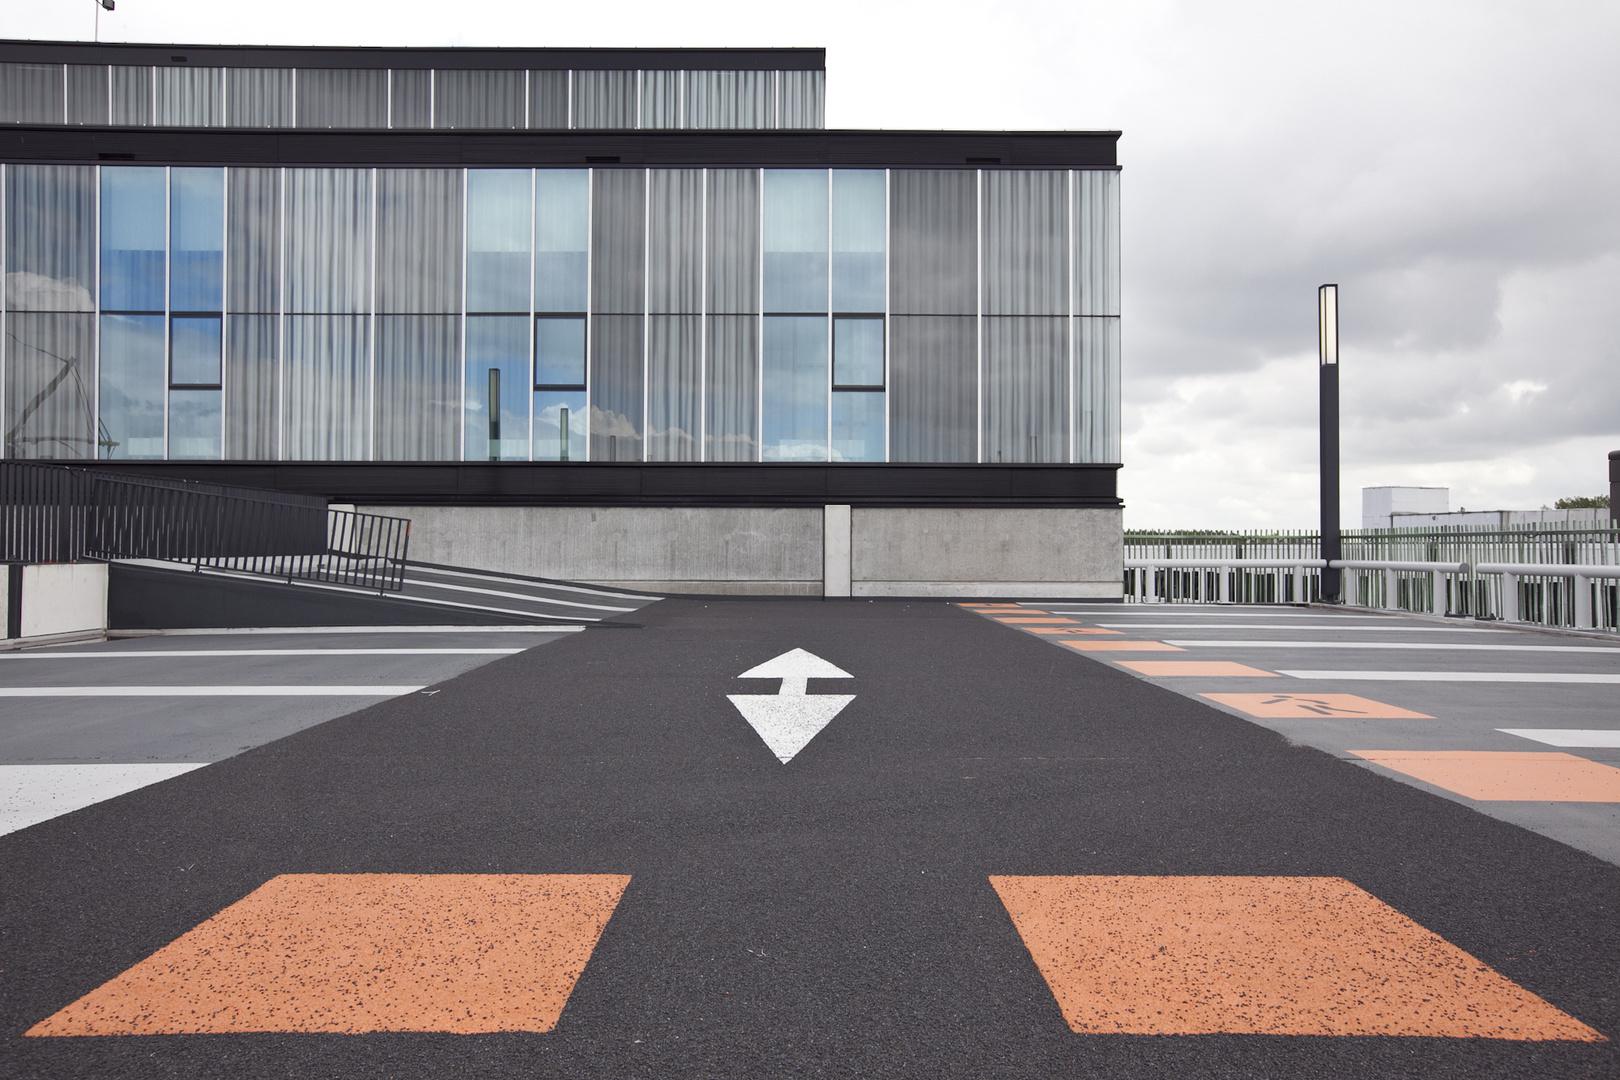 NL_Nieuwegein_Parking_Theater_Interior_2012_RS-14.jpg